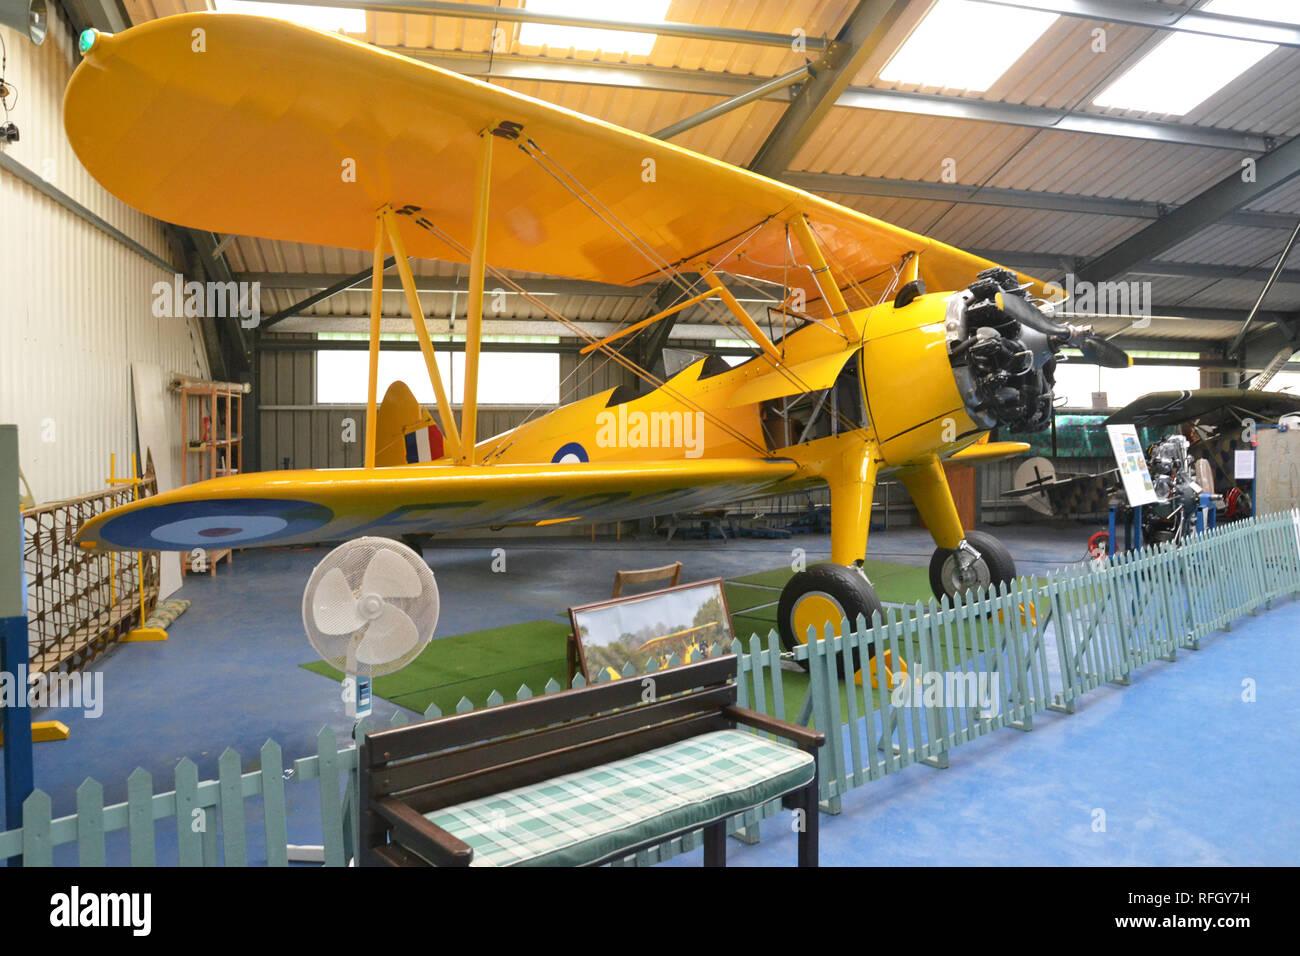 Boeing Stearman PT-27 Kaydet at the Norfolk and Suffolk Aviation Museum, Flixton, Suffolk, UK - Stock Image